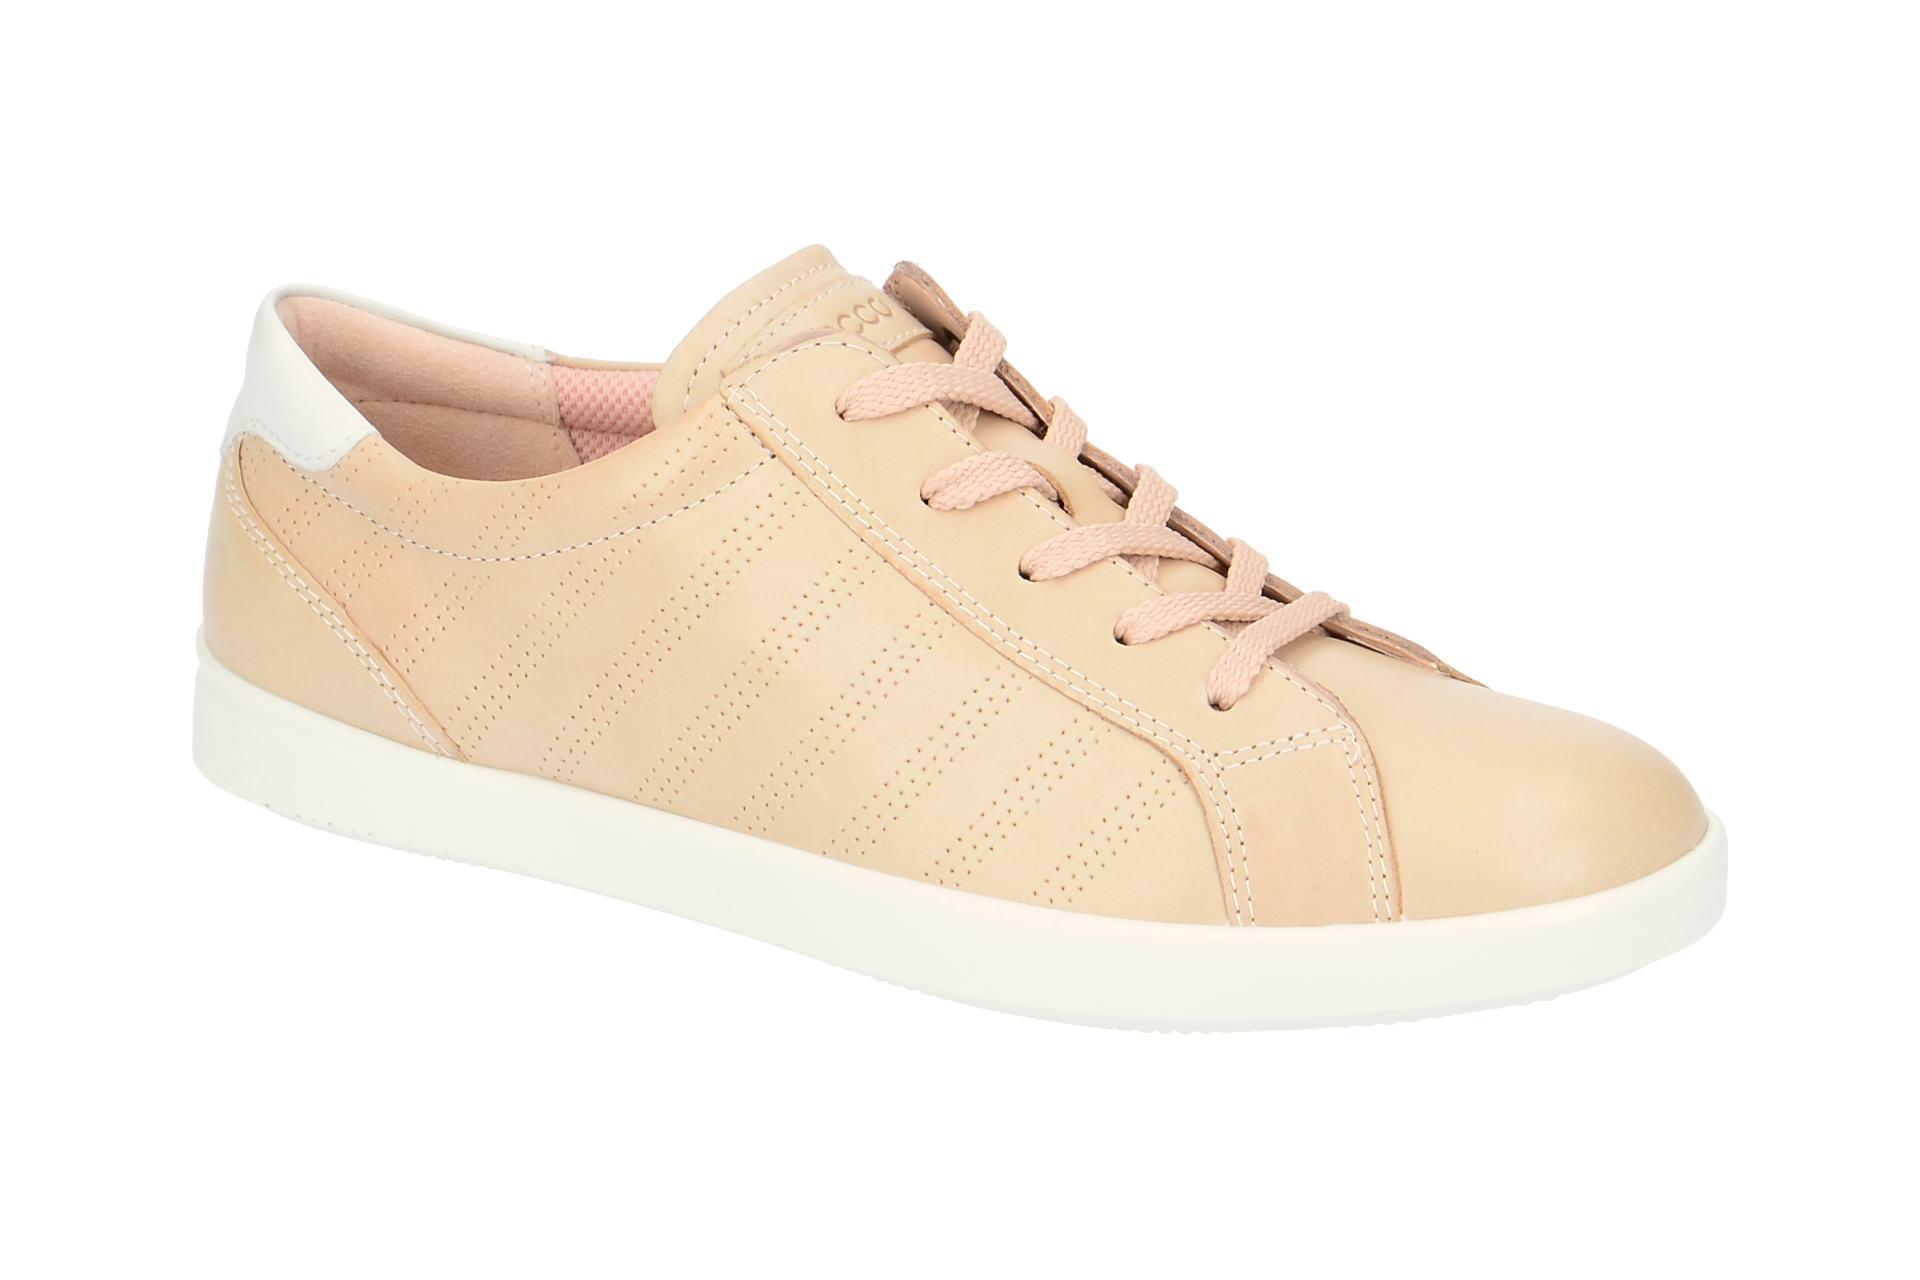 48c1ce01f0c4b5 Ecco Schuhe Damen Sneakers AIMEE rosa - Schuhhaus Strauch Shop